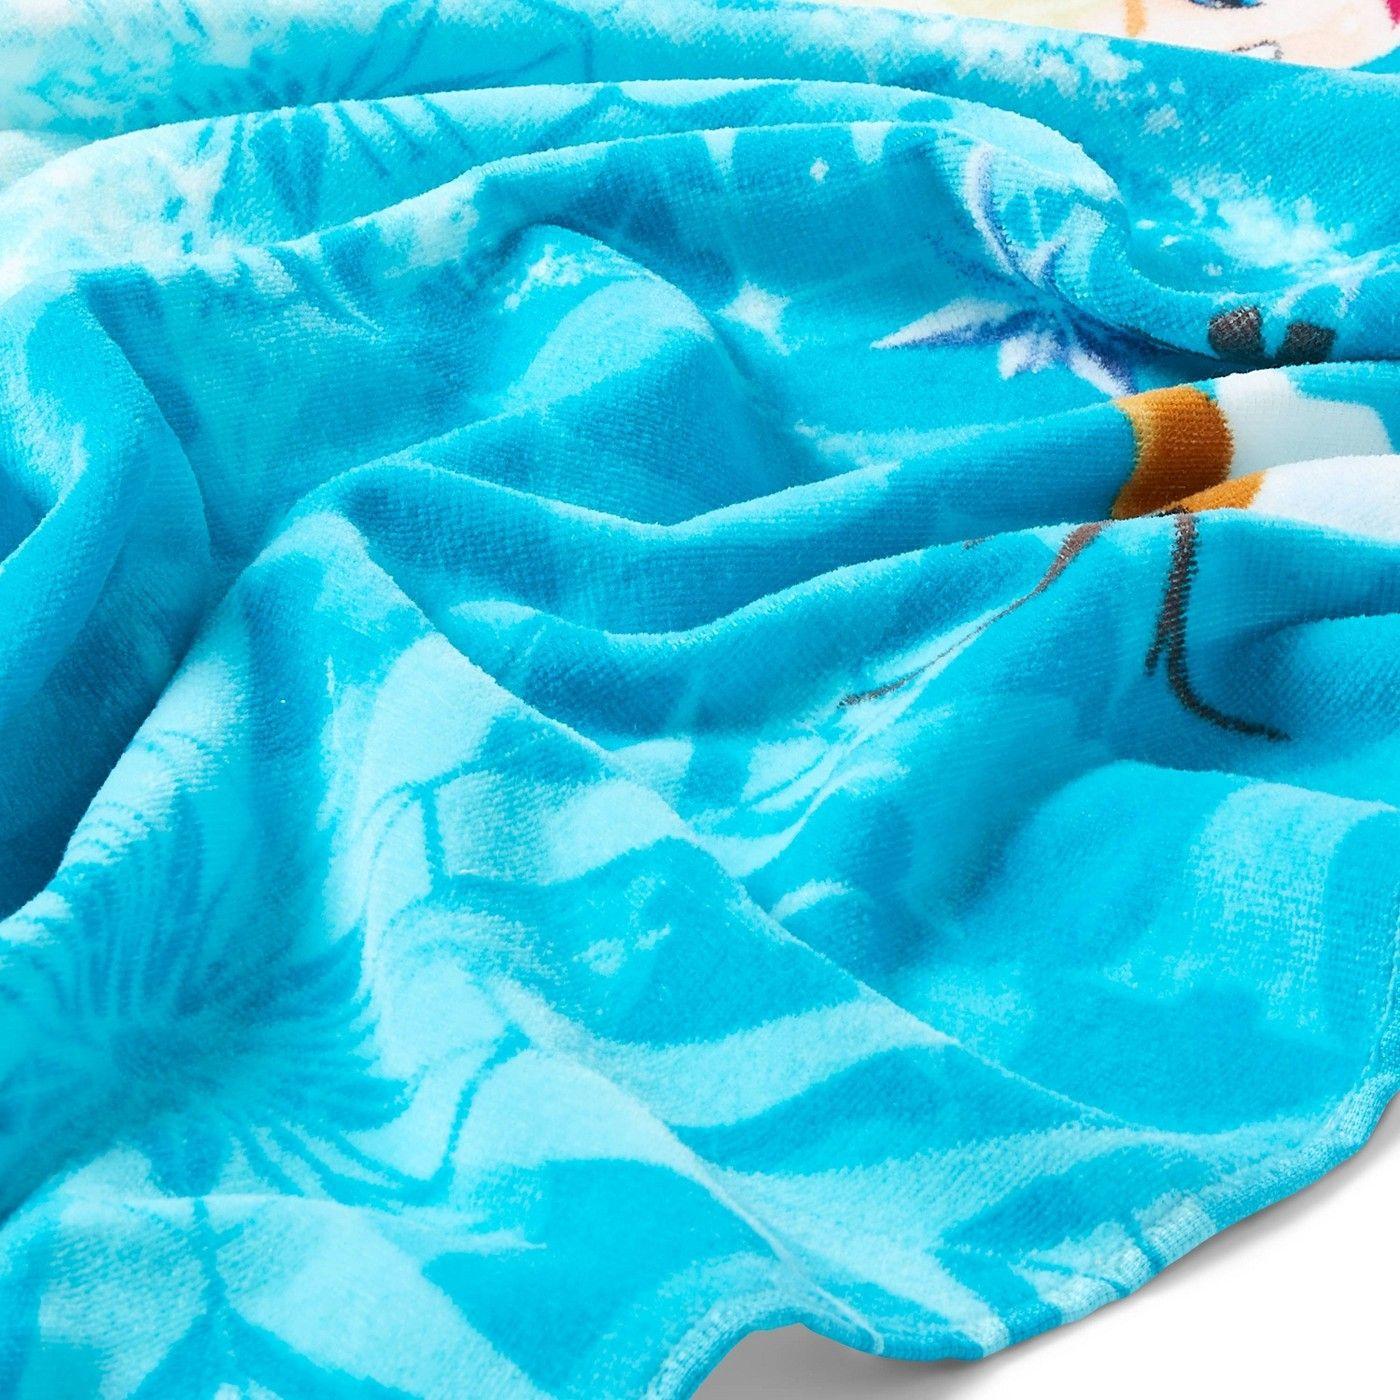 Frozen sister of olaf beach towel sponsored sister